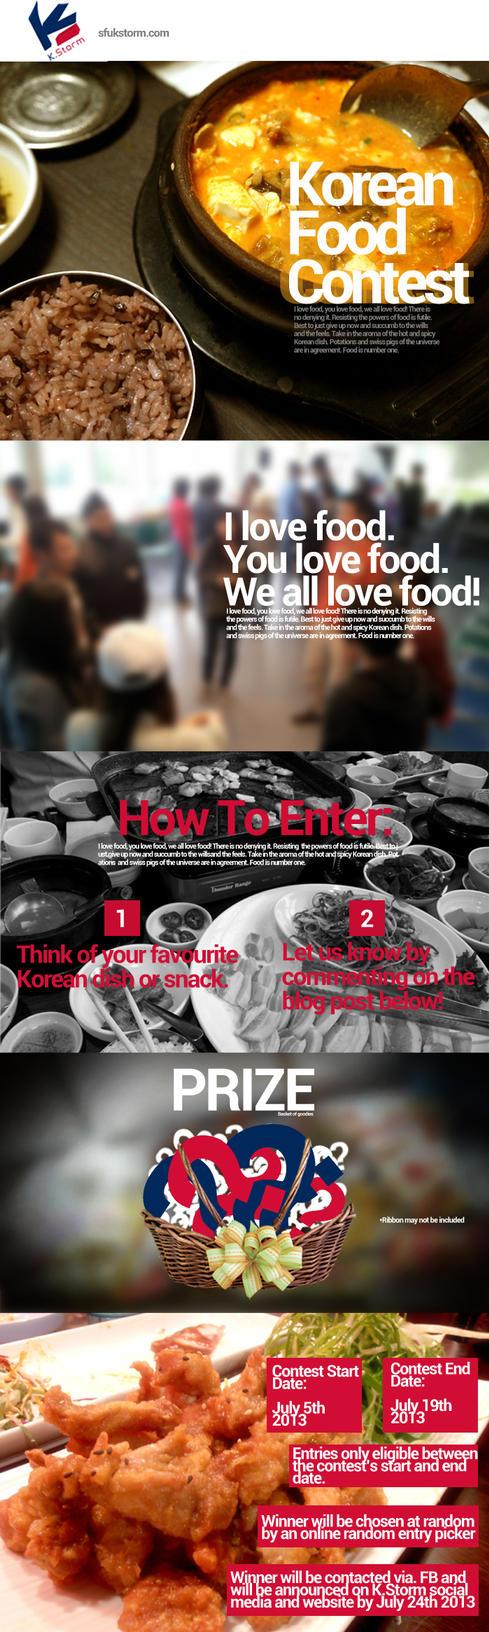 SFU K.STORM Summer 2013 Korean Food Contest1 by UberzErO